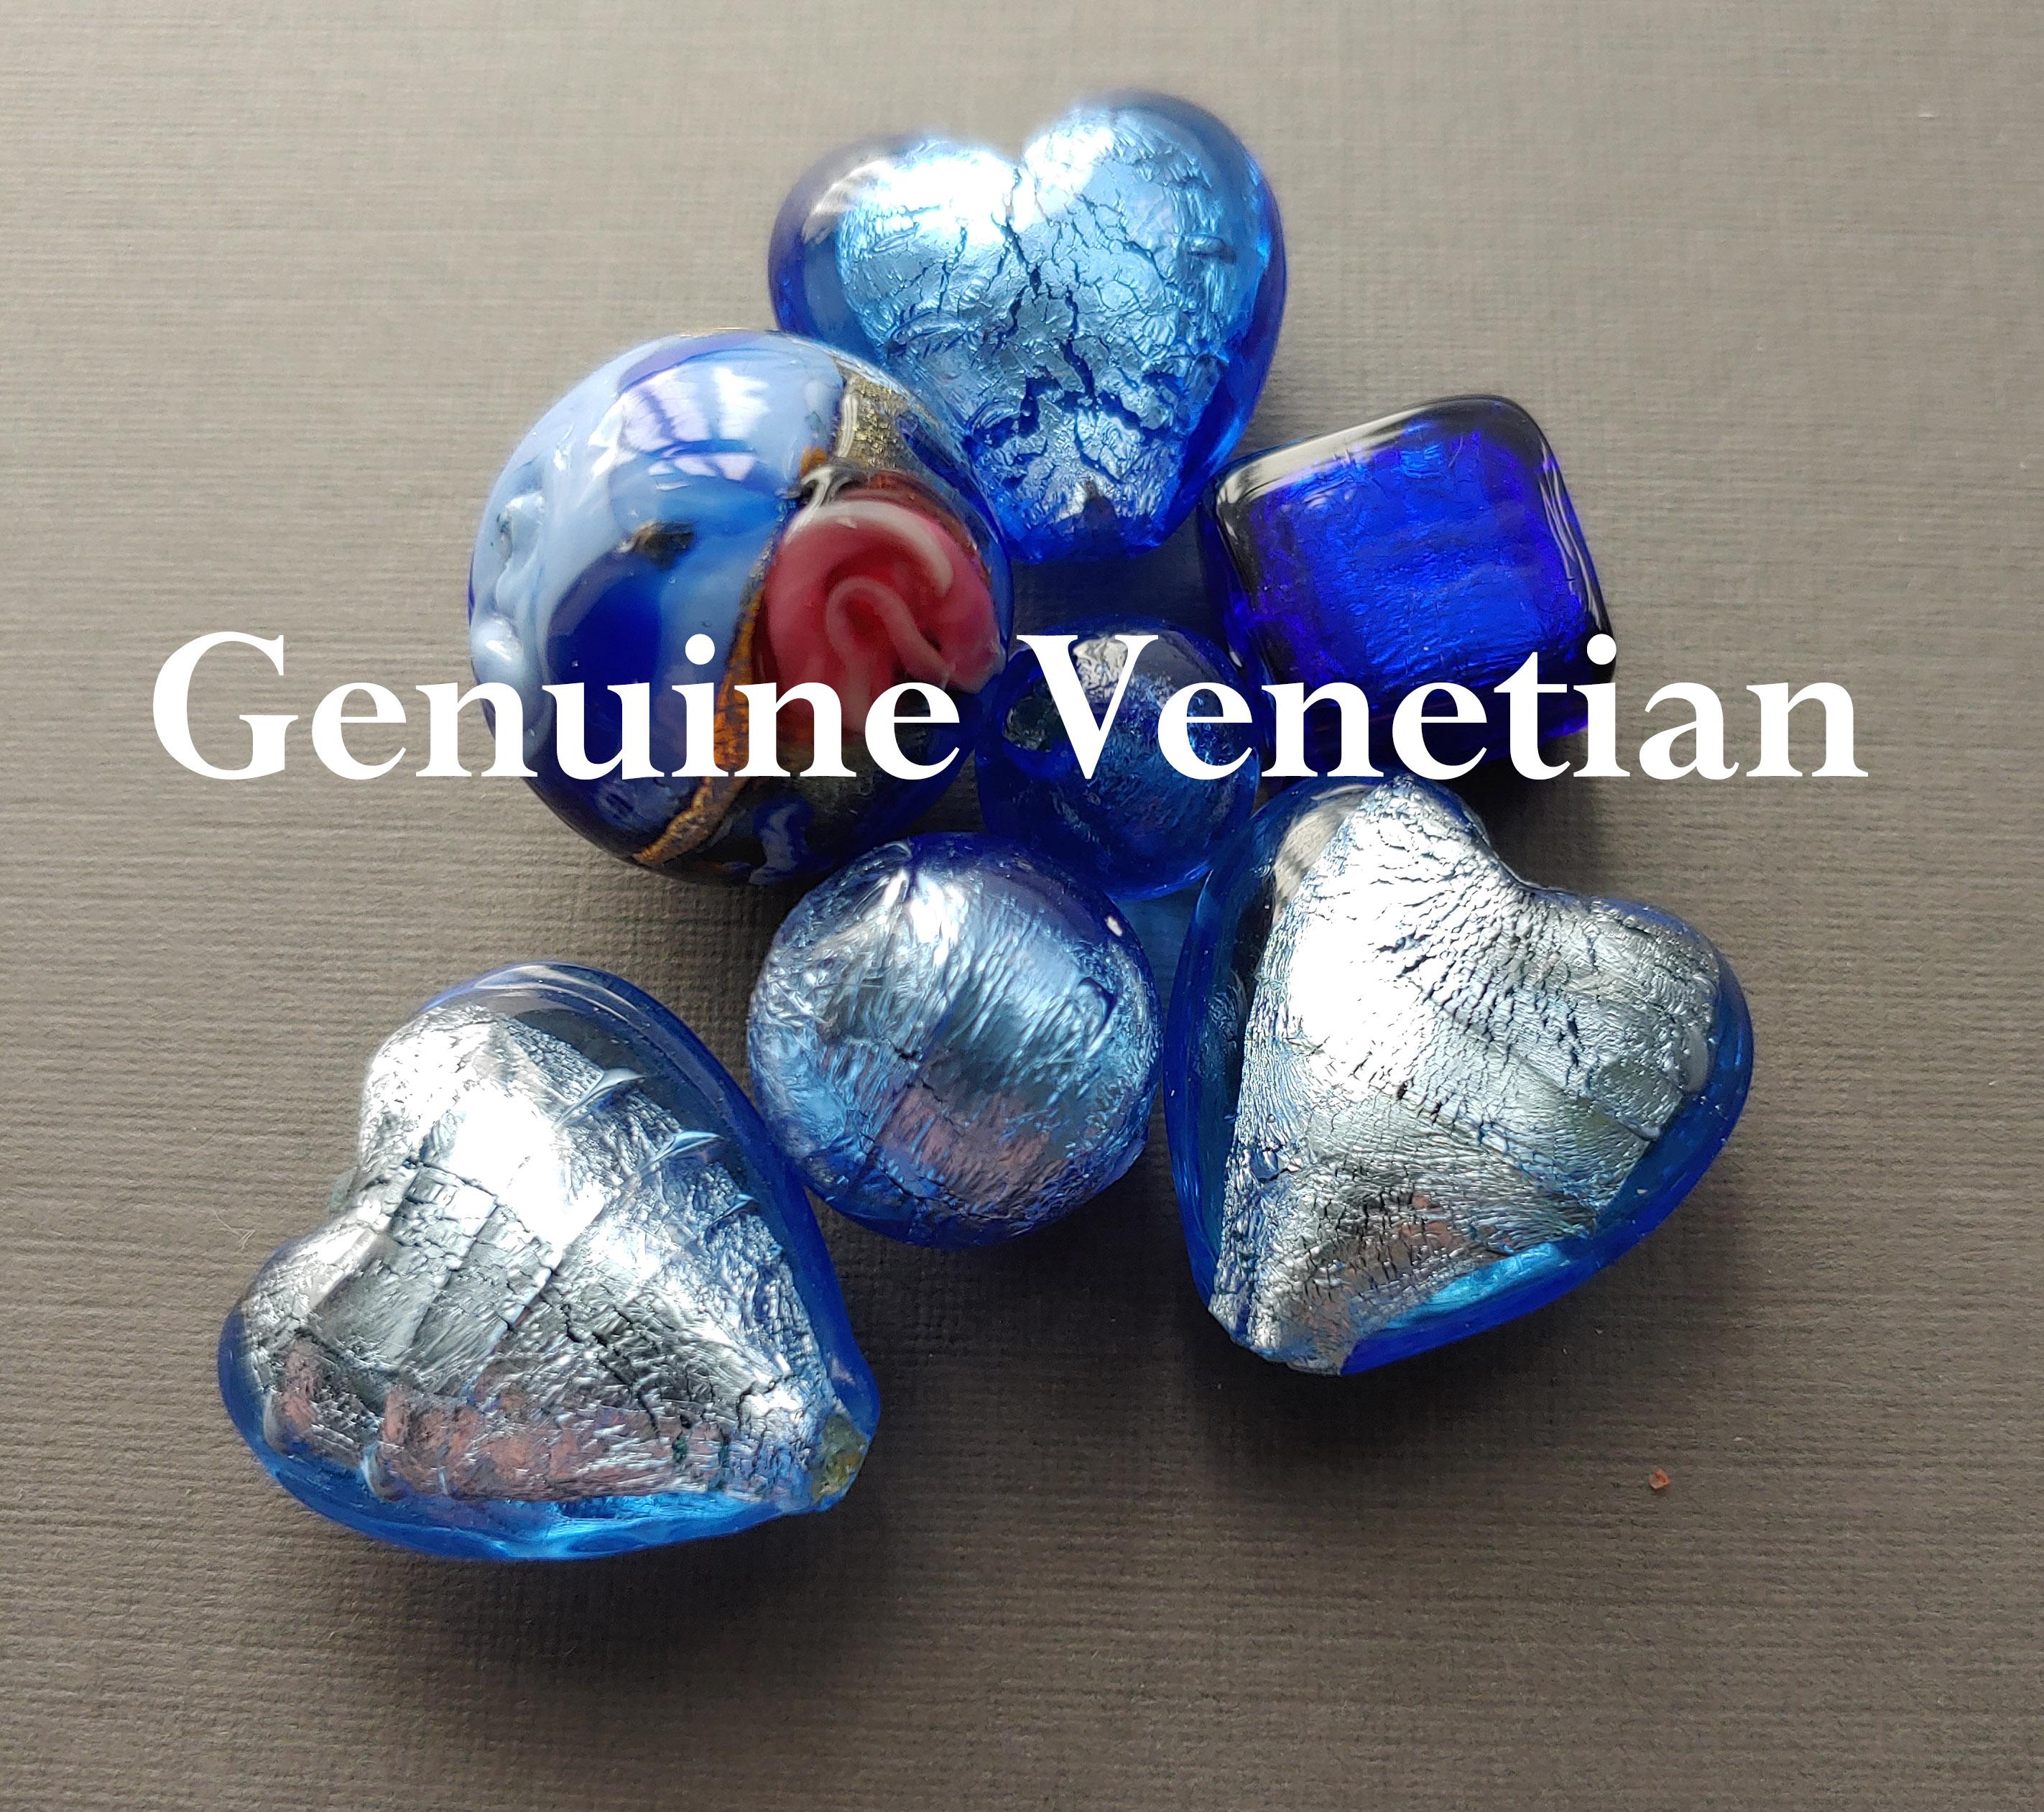 Authenic Venetian Glass Beads